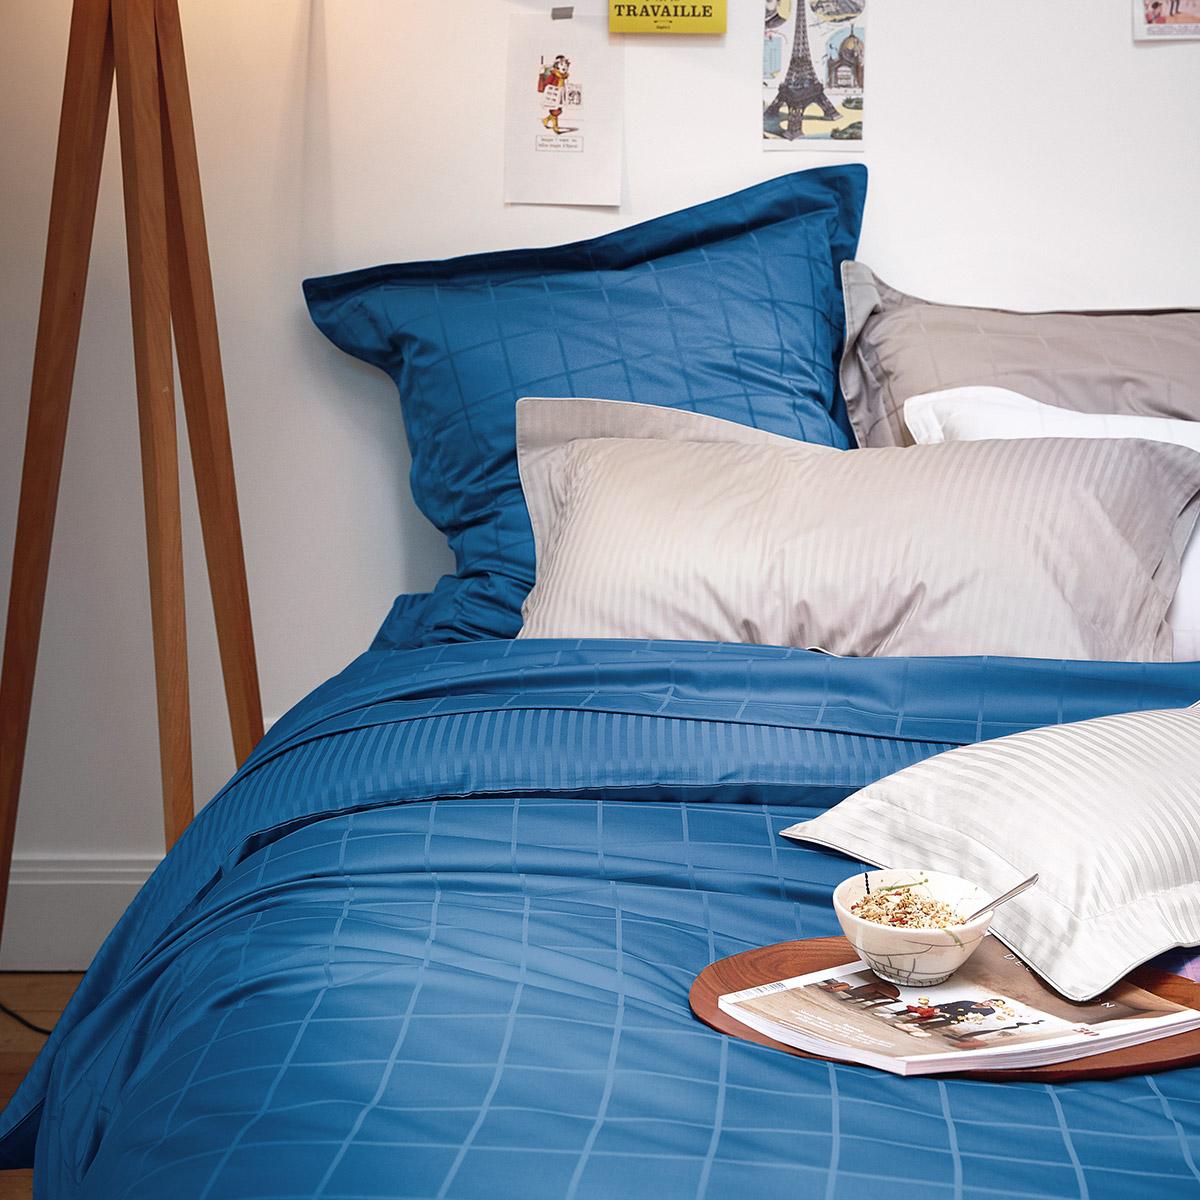 Drap housse satin Bleu 90 x 200 cm